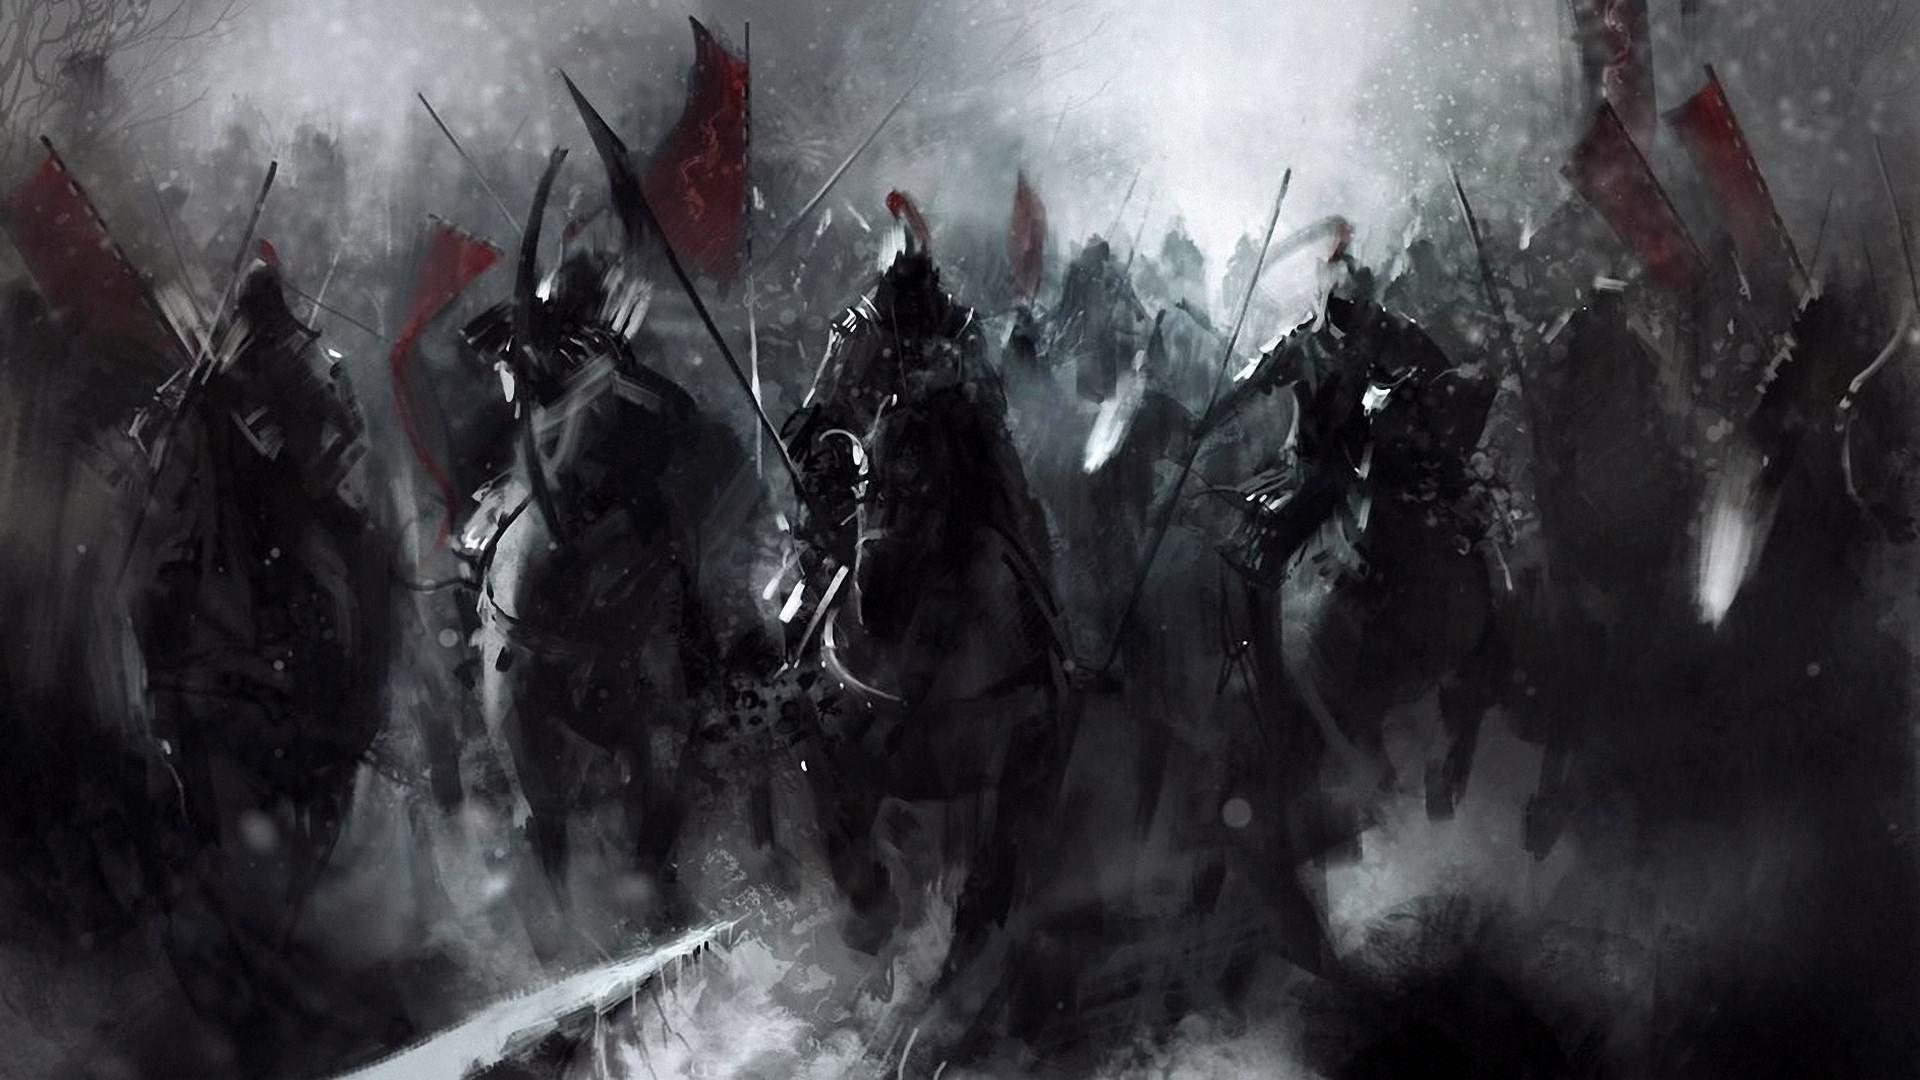 Epic fantasy wallpapers dark 1080p amazing wallpapers - Fantasy wallpaper dark ...